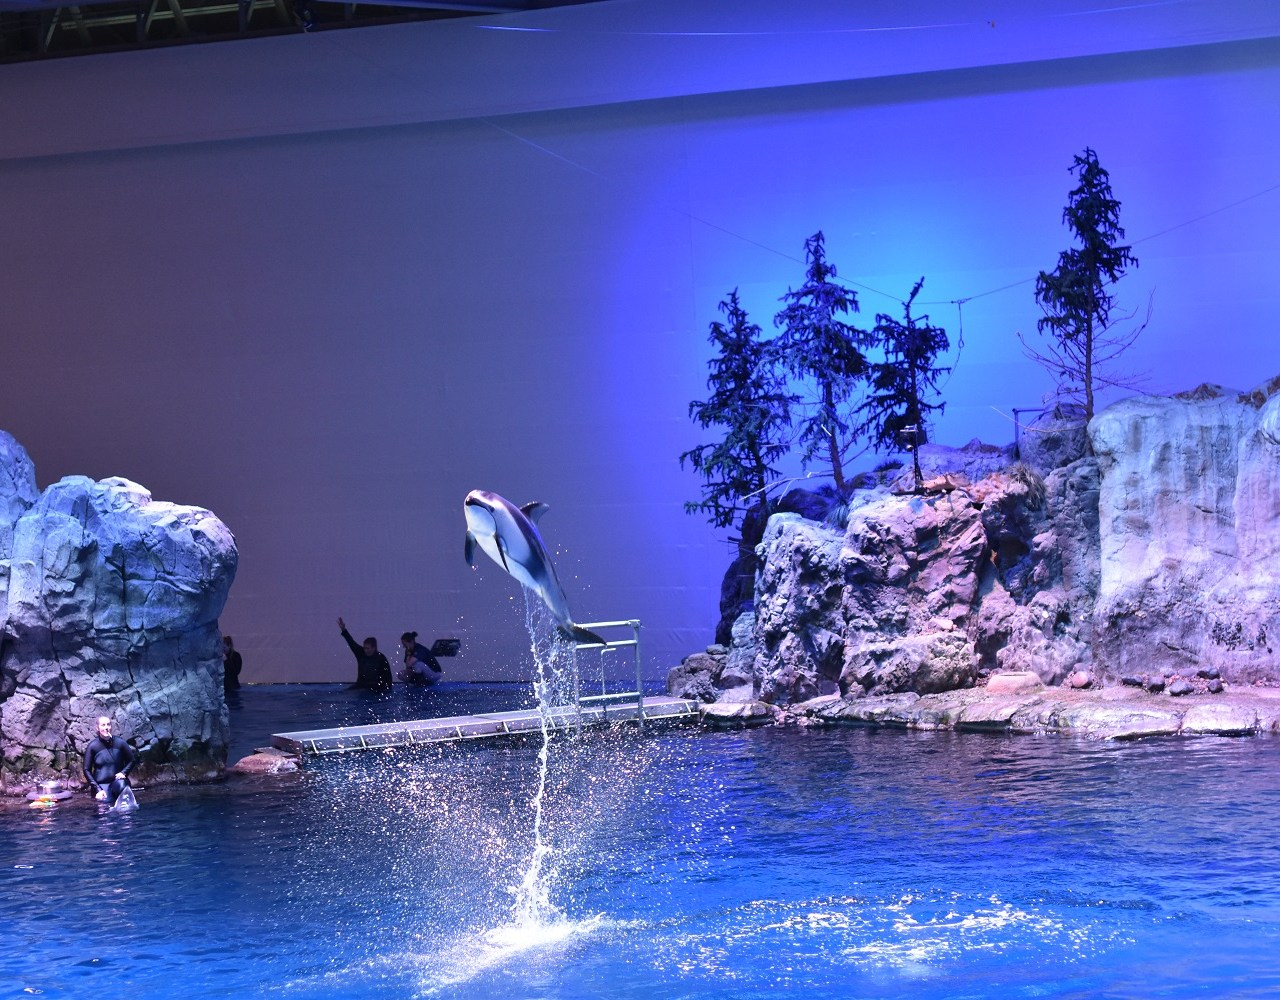 Shedd Aquarium With a Newborn & Toddler